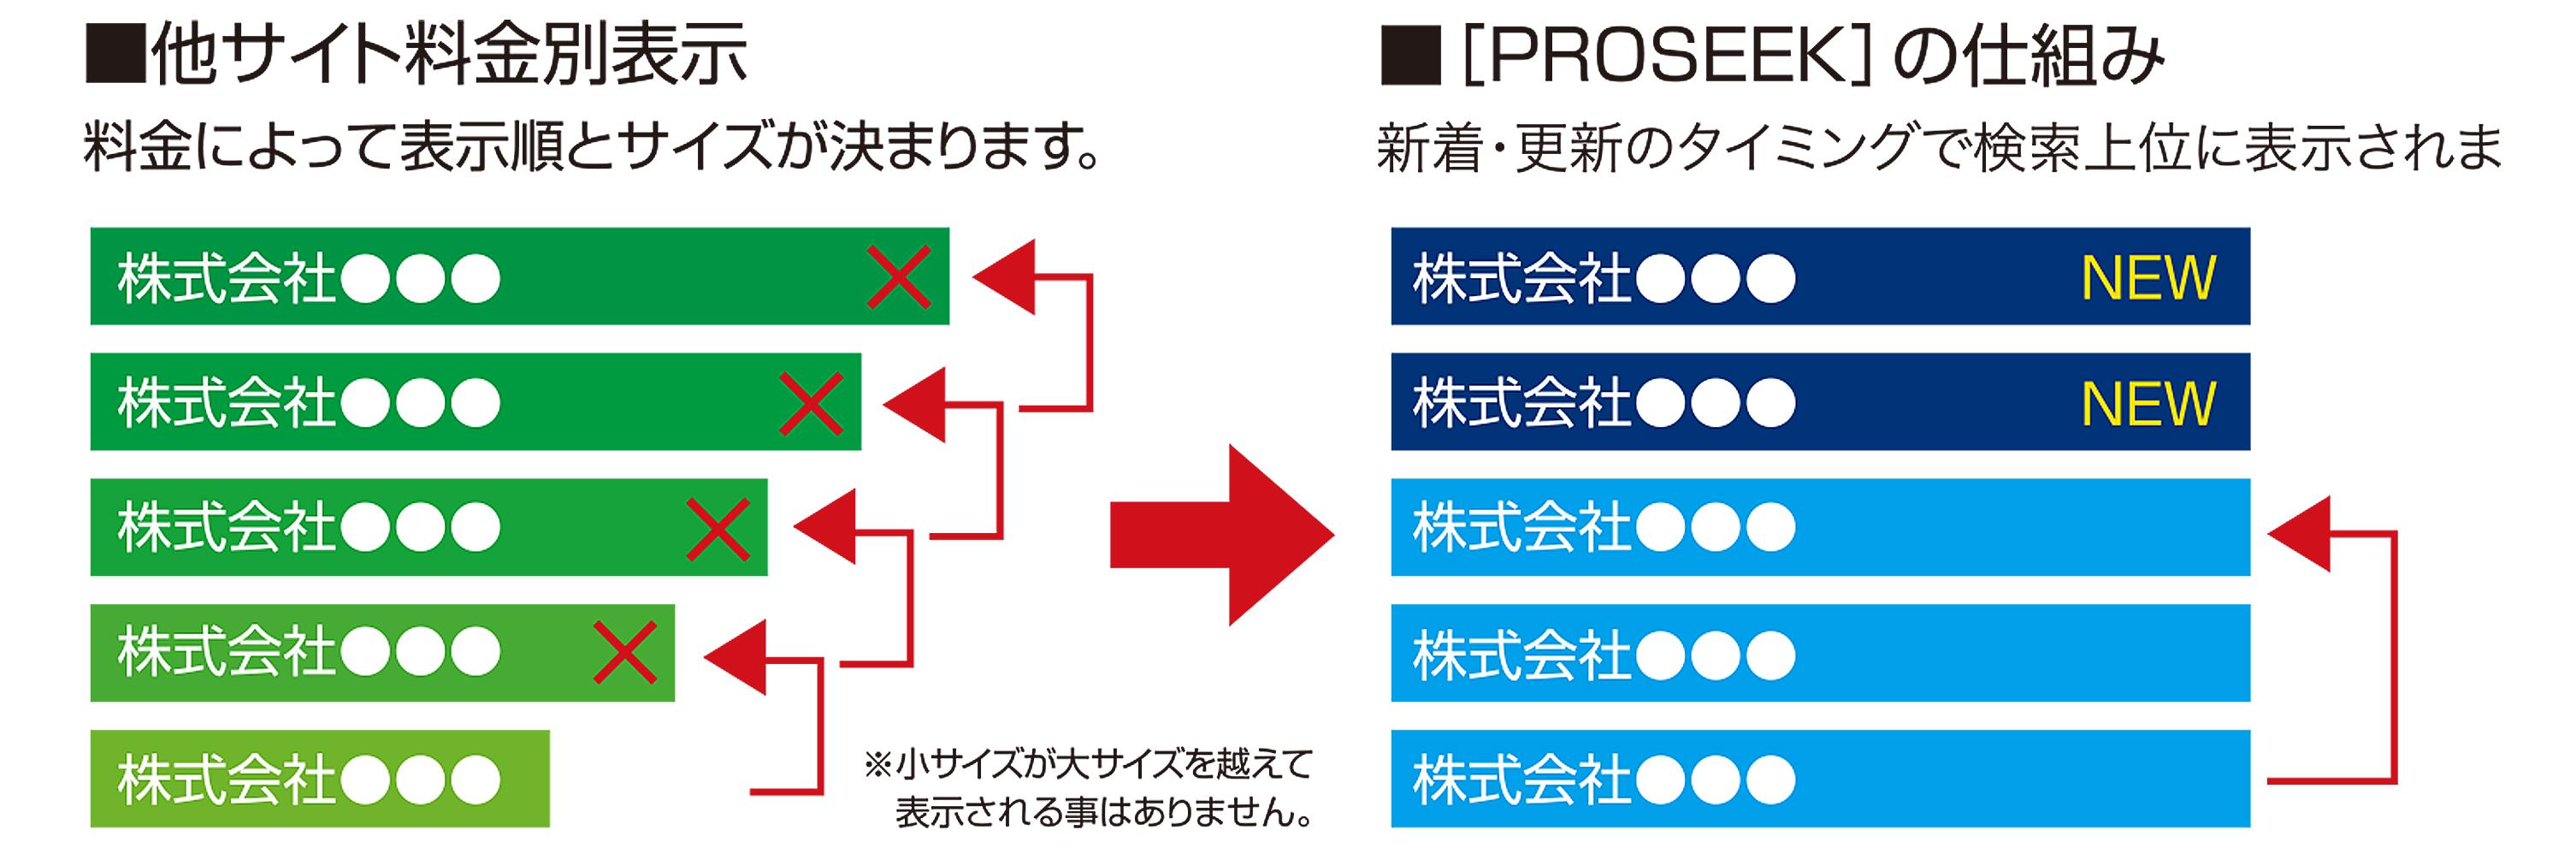 PROSEEK_document2_ph